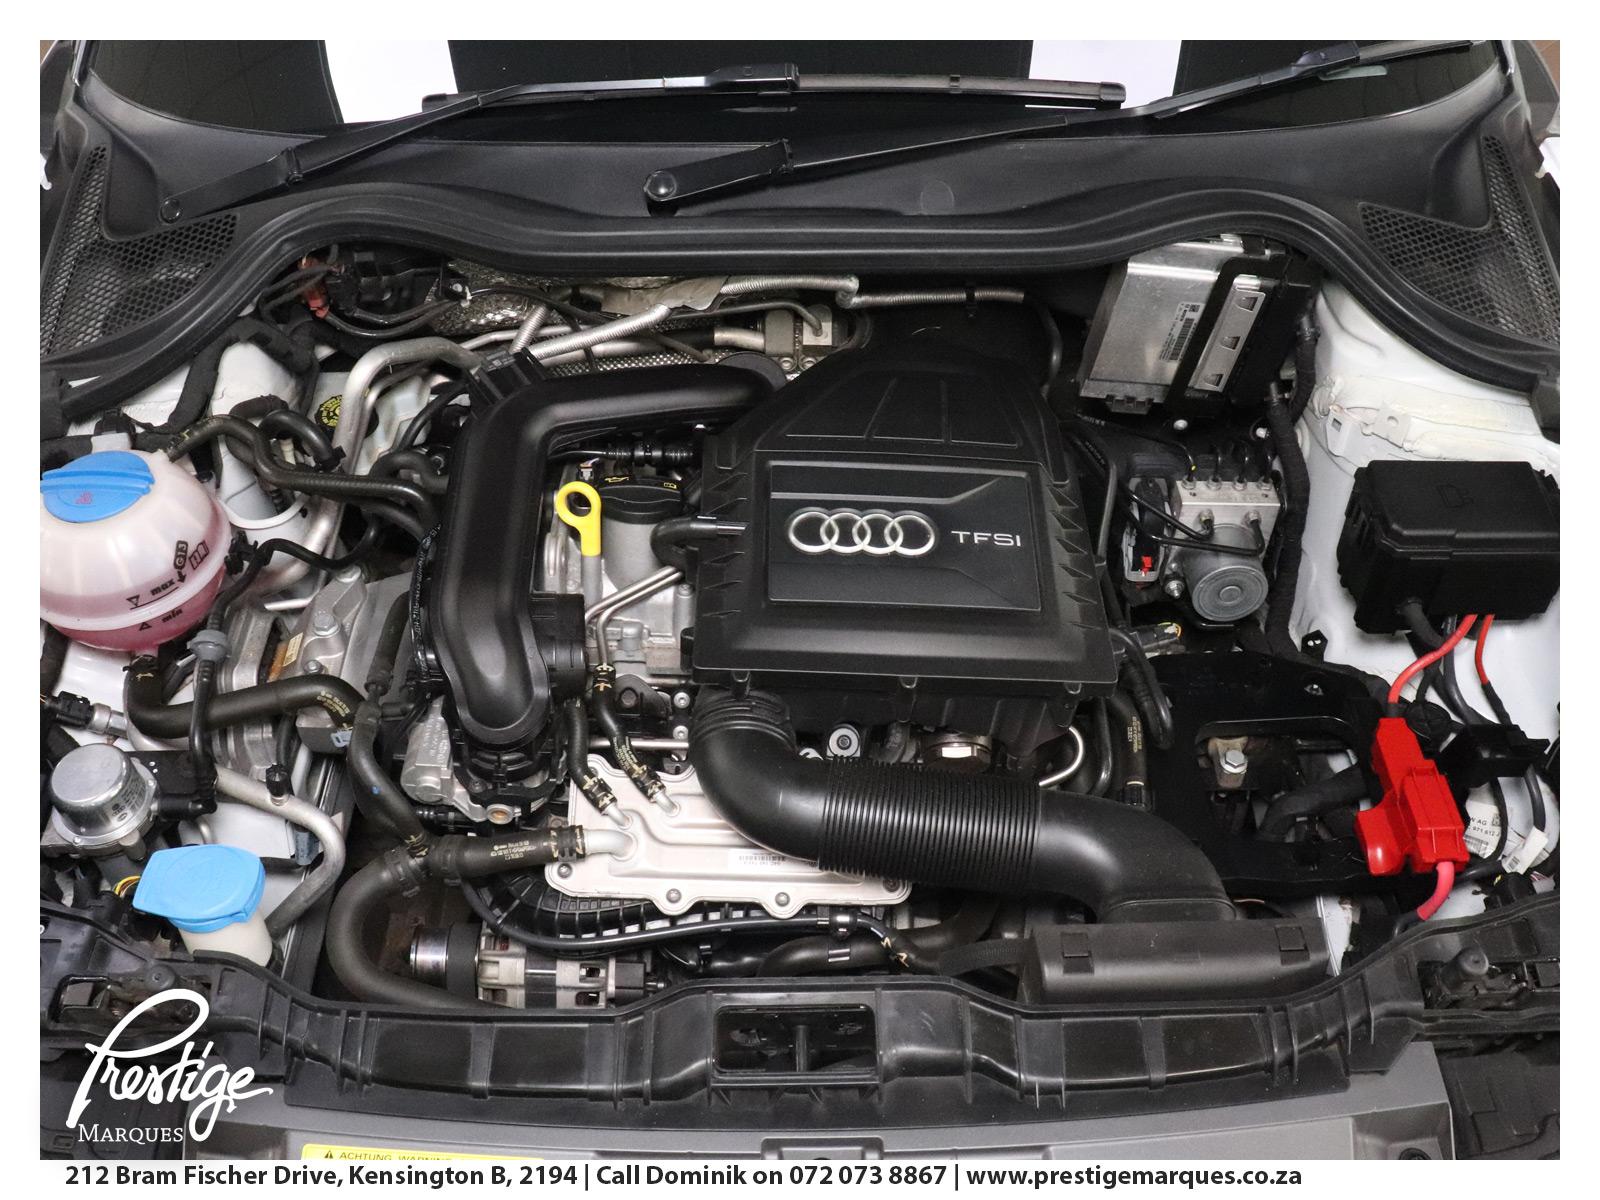 2015-Audi-A1-Prestige-Marques-Randburg-Sandton-8